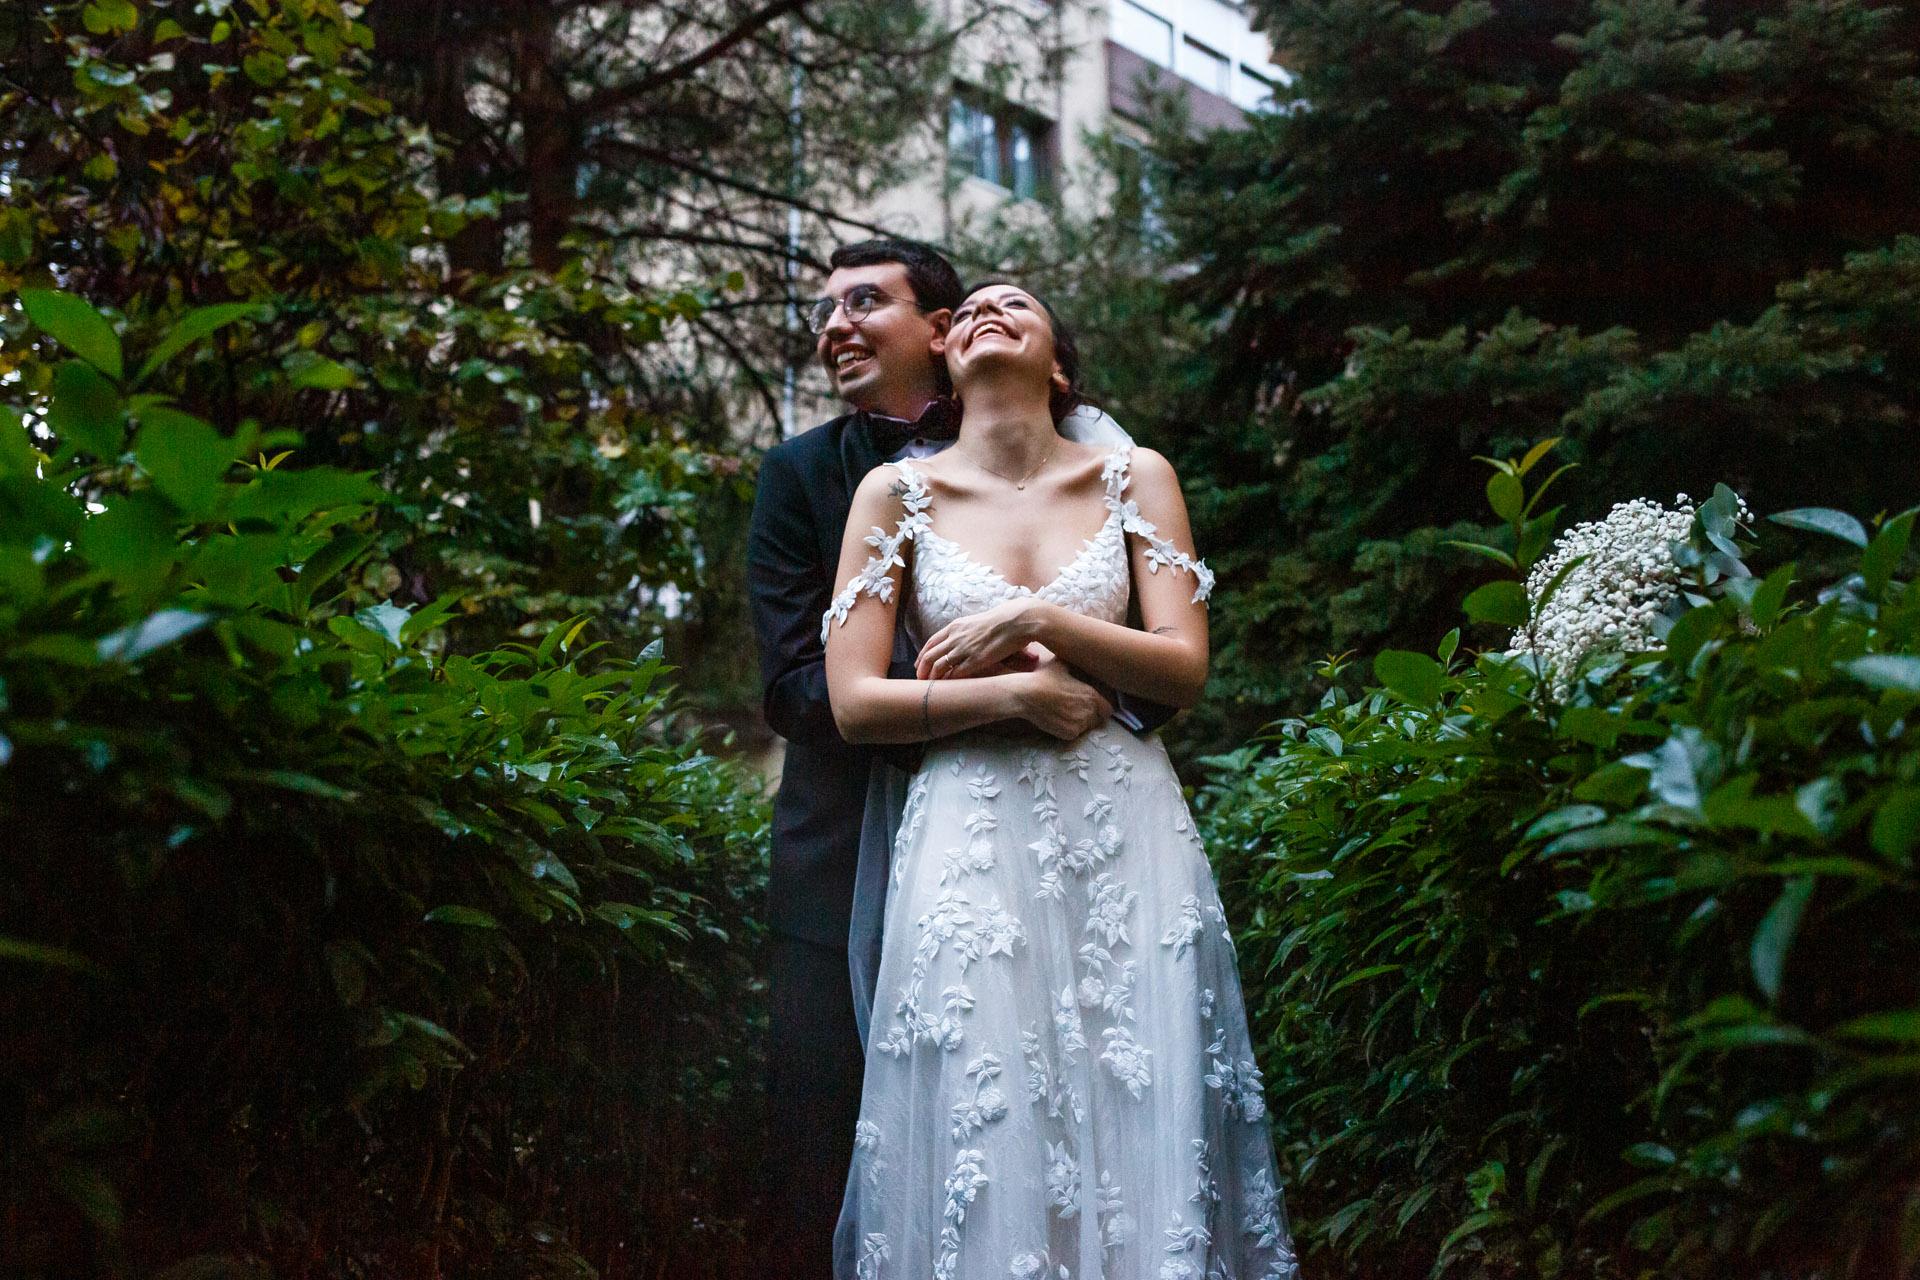 Wedding Photographer for Sisli Evlendime Dairesi | The couple shooting was pretty fun